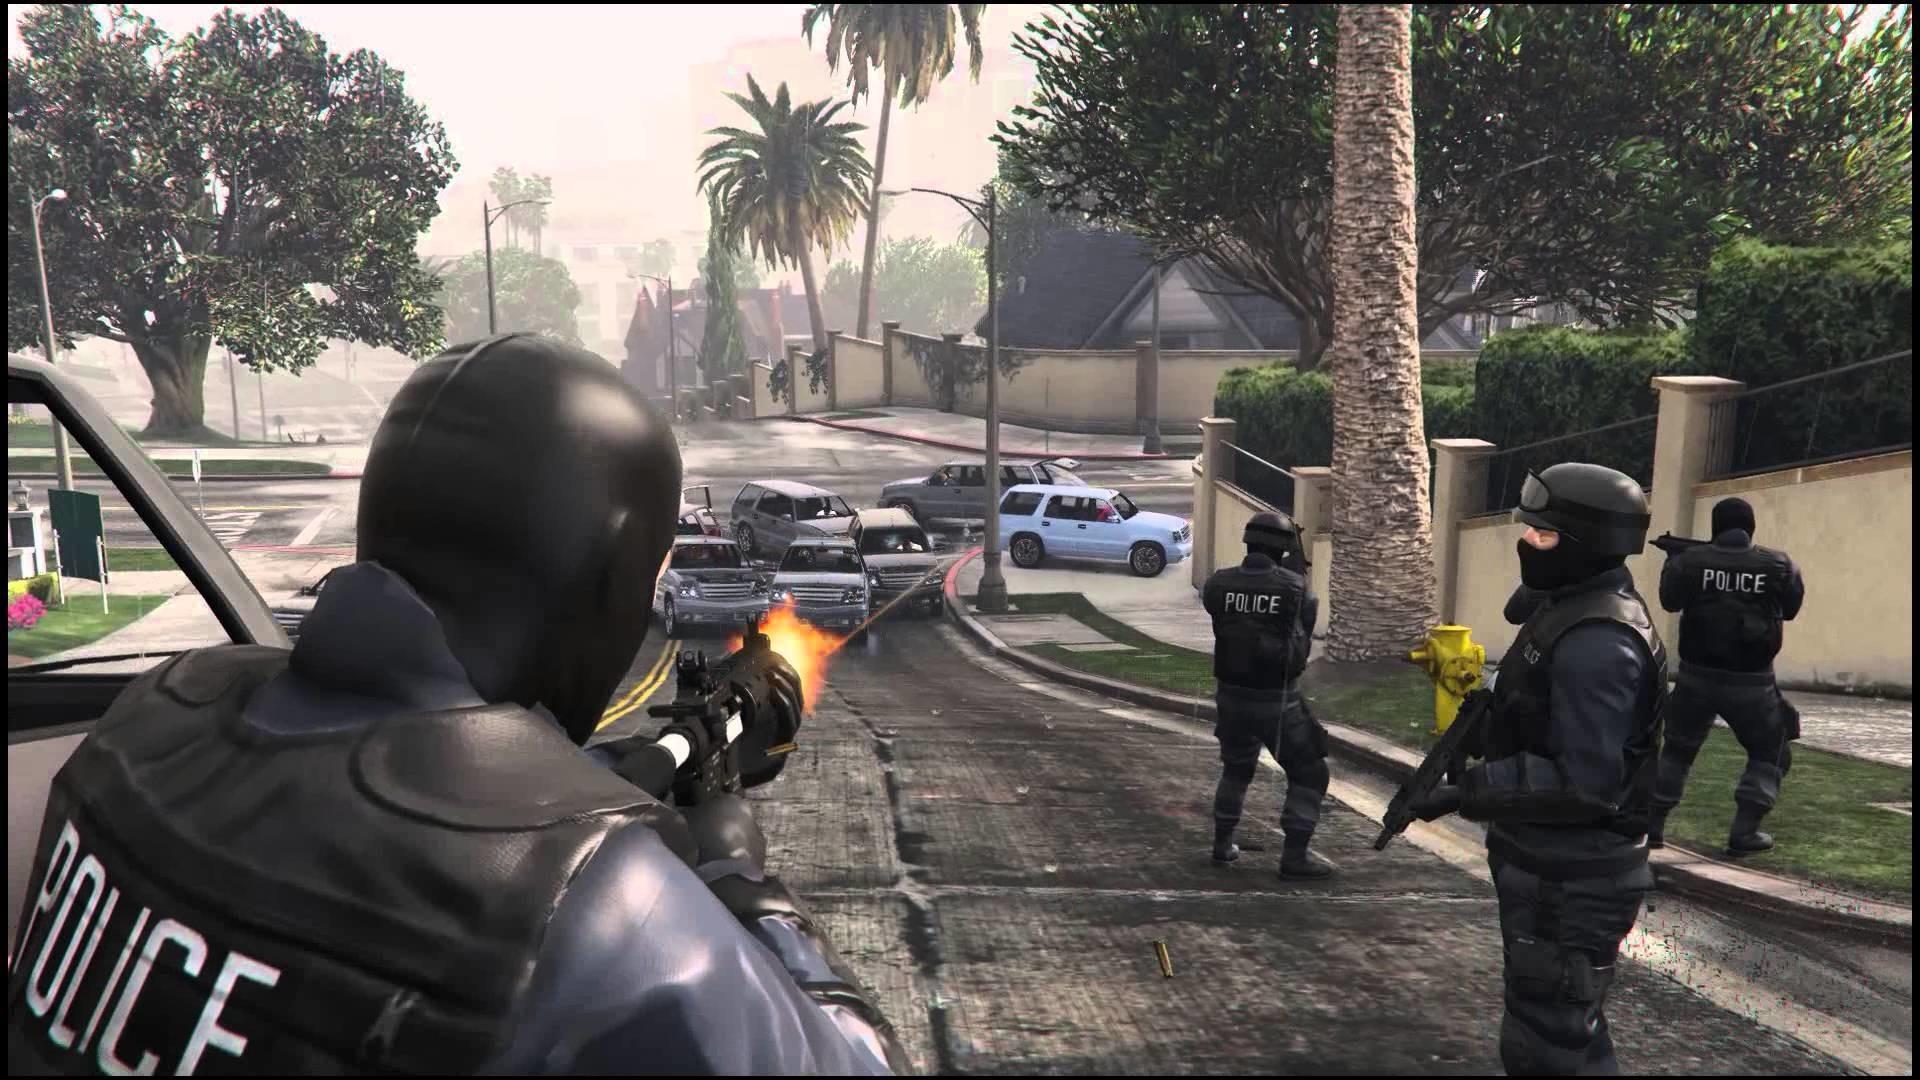 Res: 1920x1080, 1920x1440 SWAT team waiting to conduct raid. Photo credit: Daniel Wright